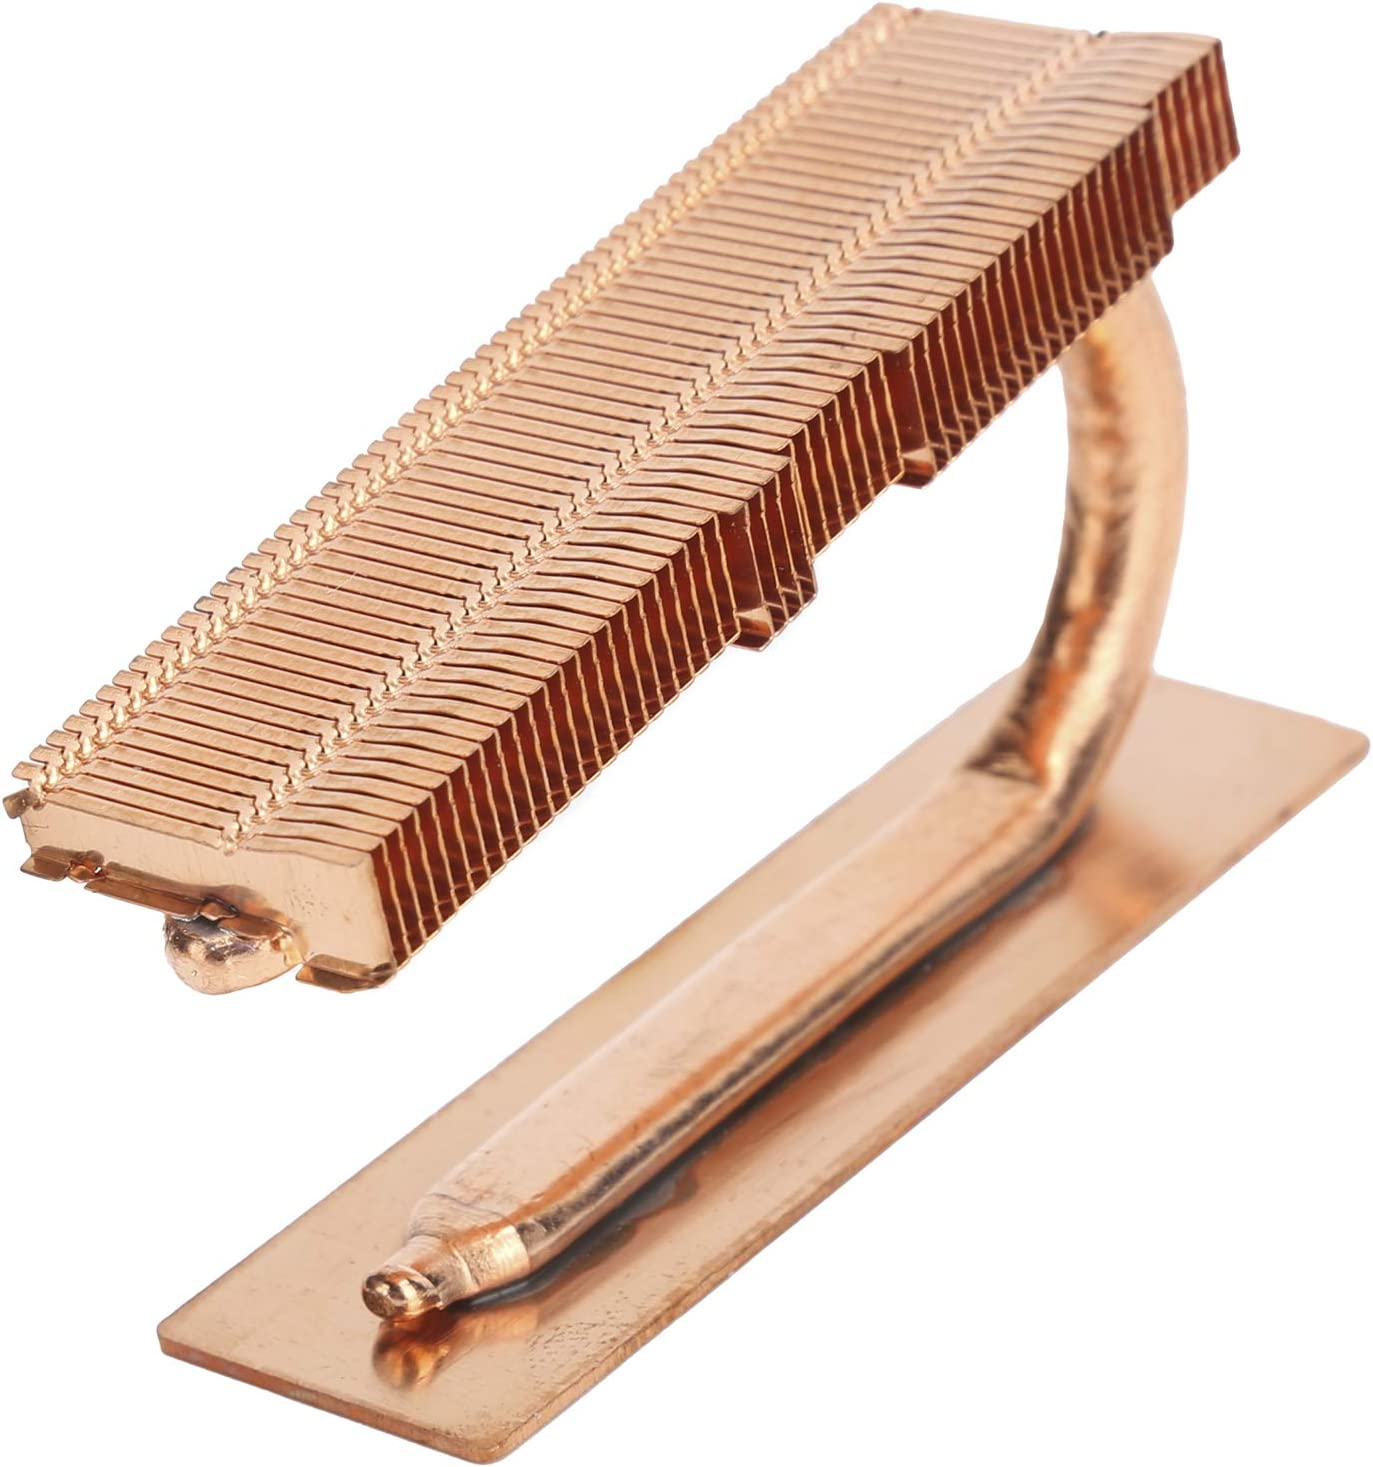 SSD Radiator Single 5 popular Tube Hard Award-winning store Cooling Copper Disk Red